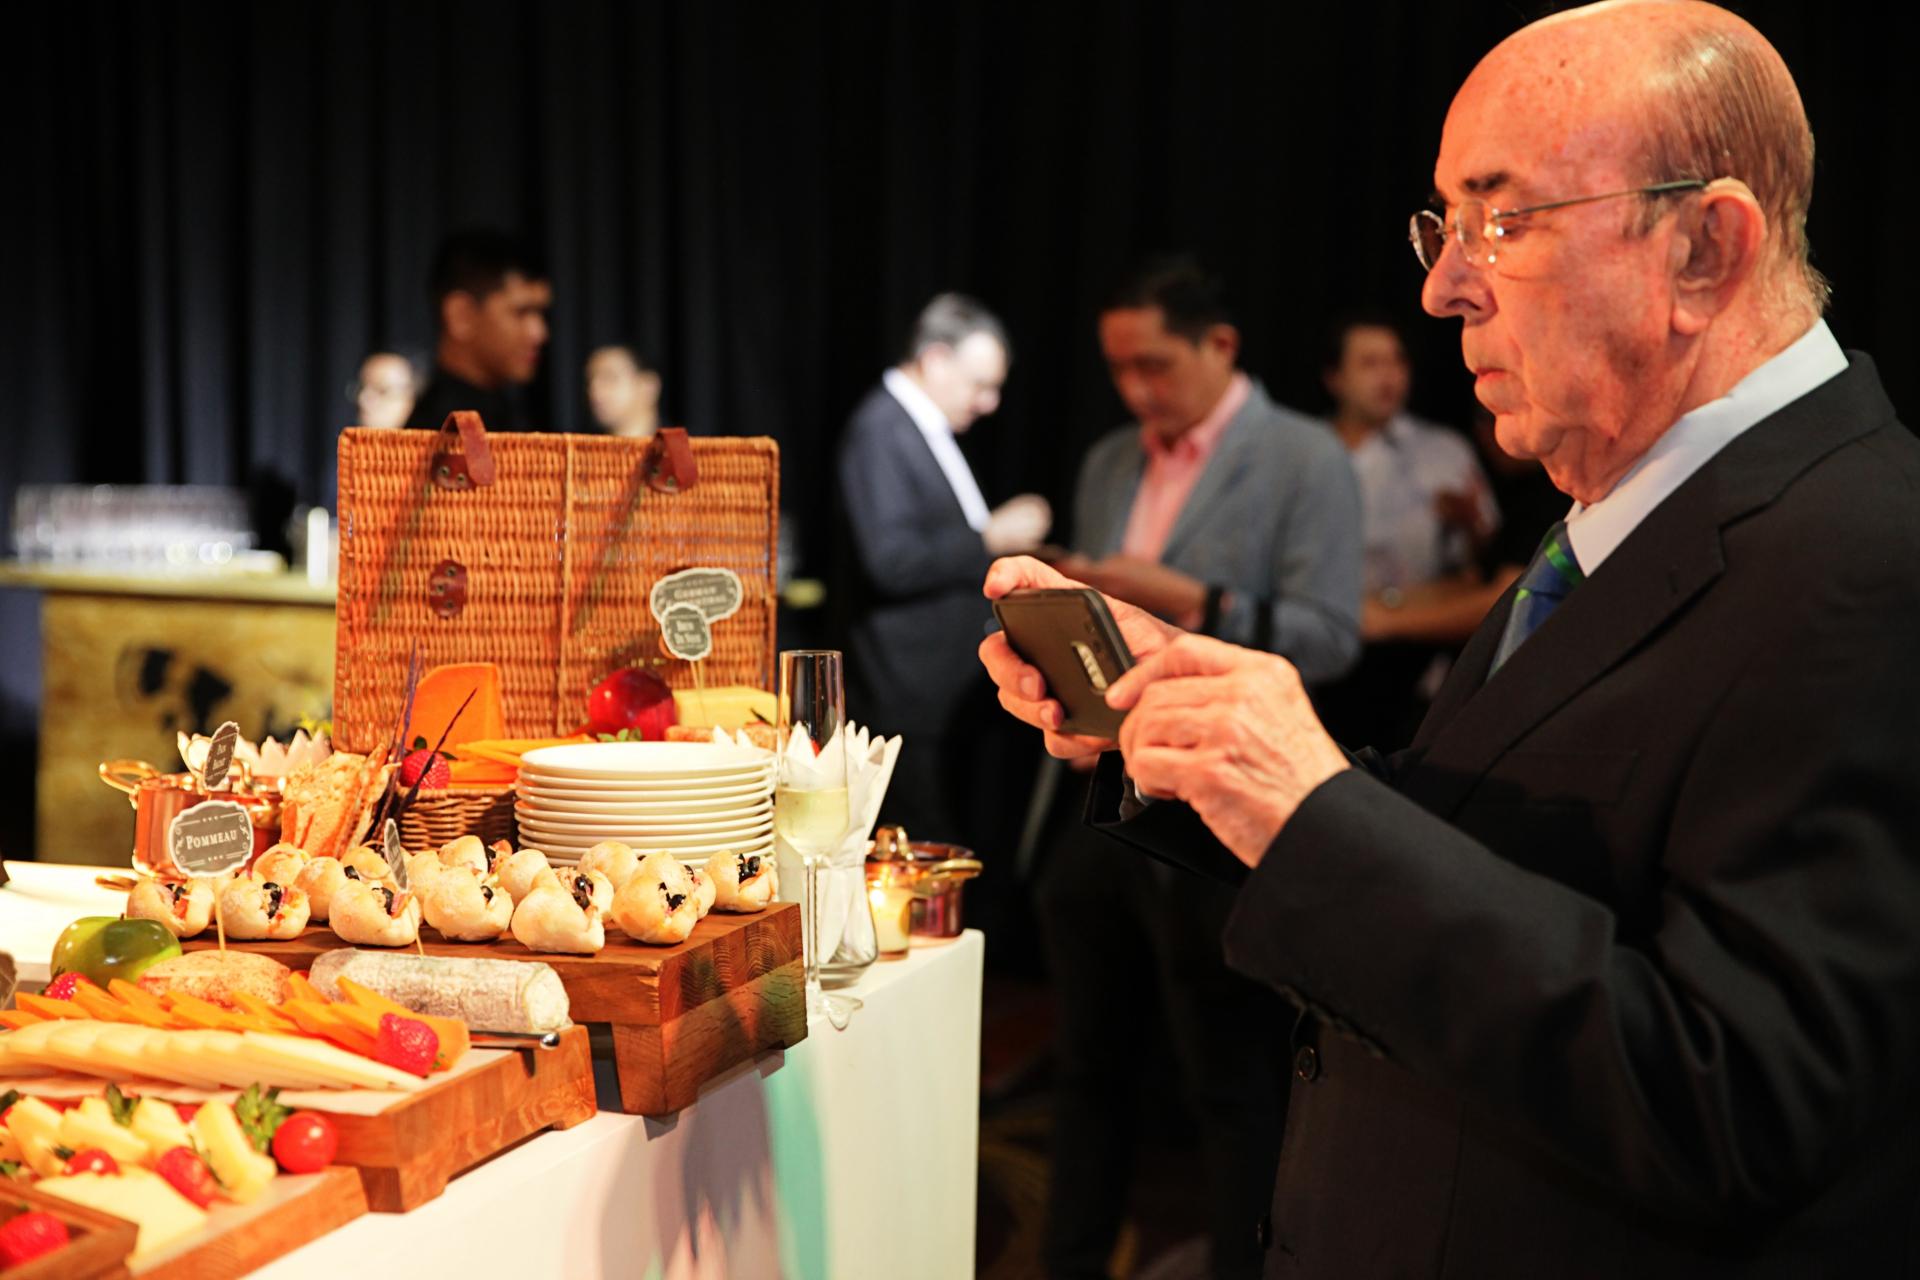 Juan Carlos de Terry getting a food shot in